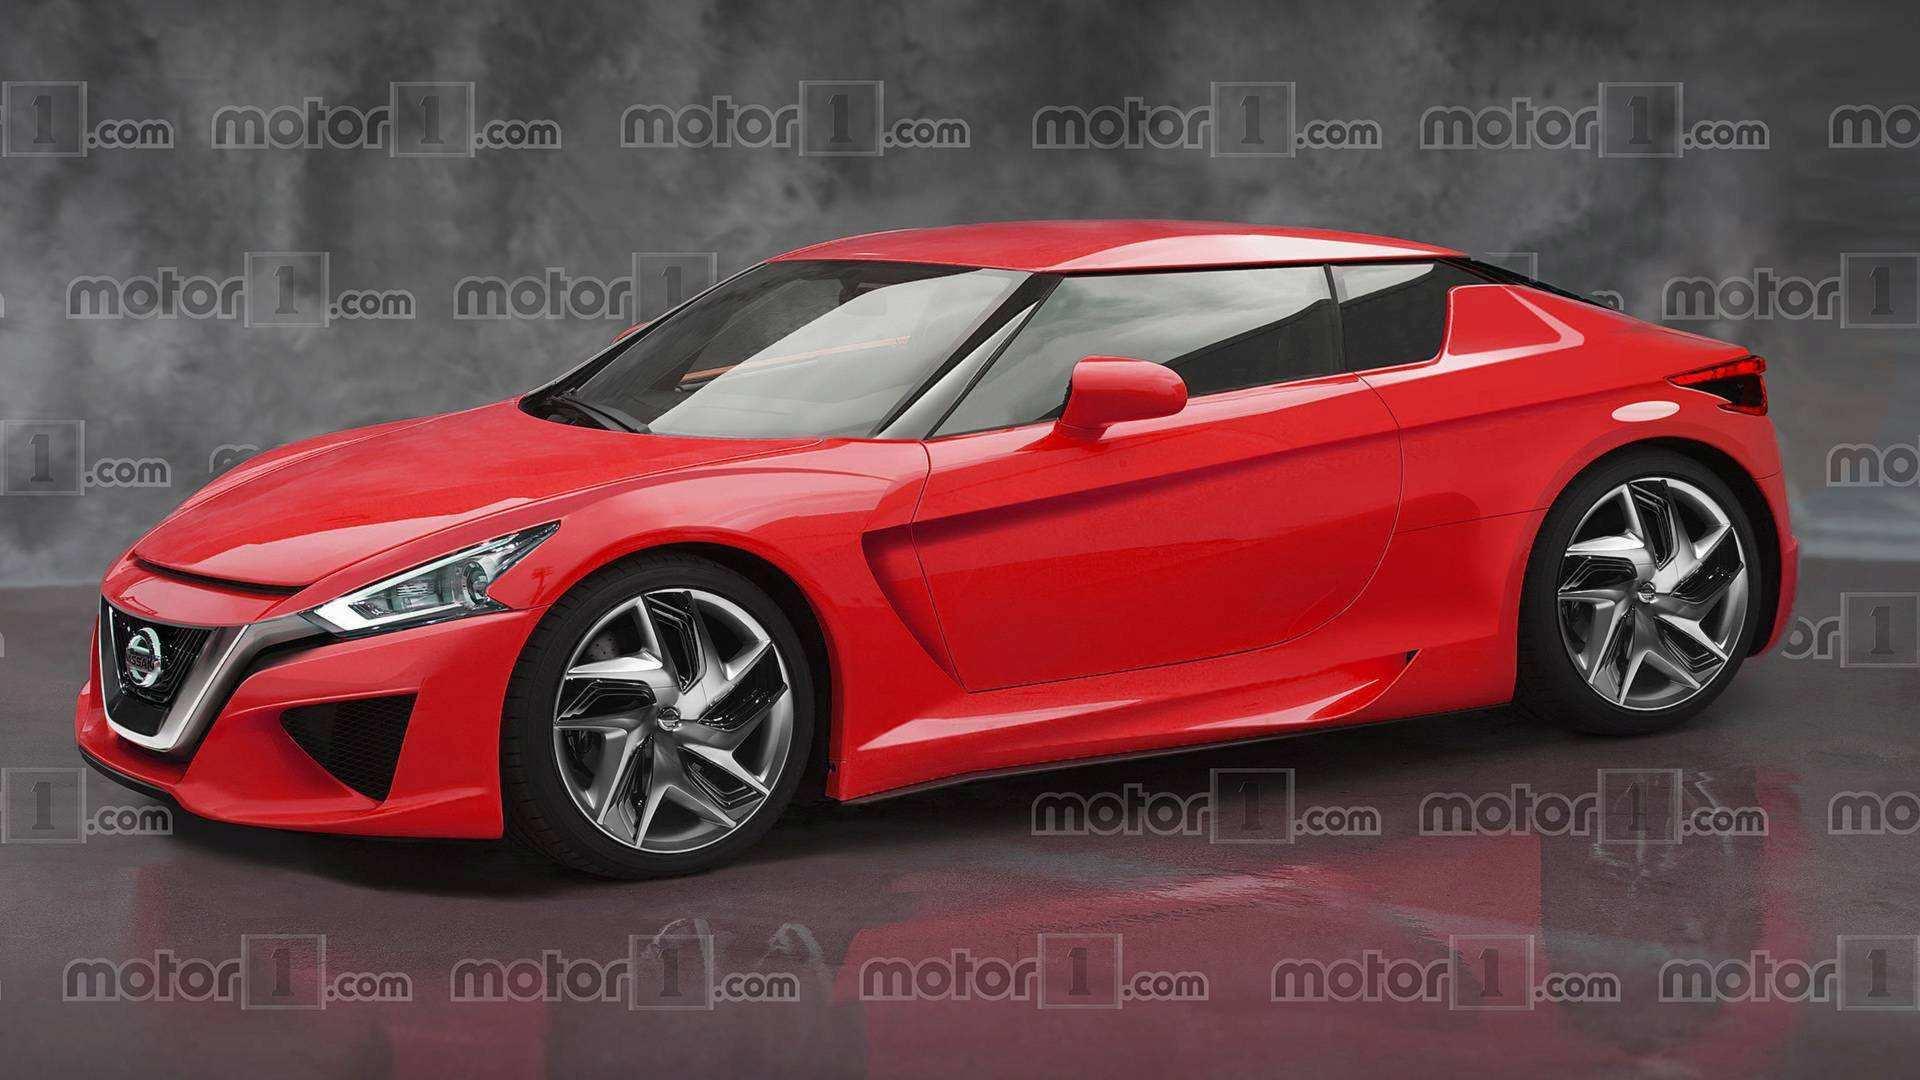 96 Gallery of Dodge Models 2020 Interior with Dodge Models 2020